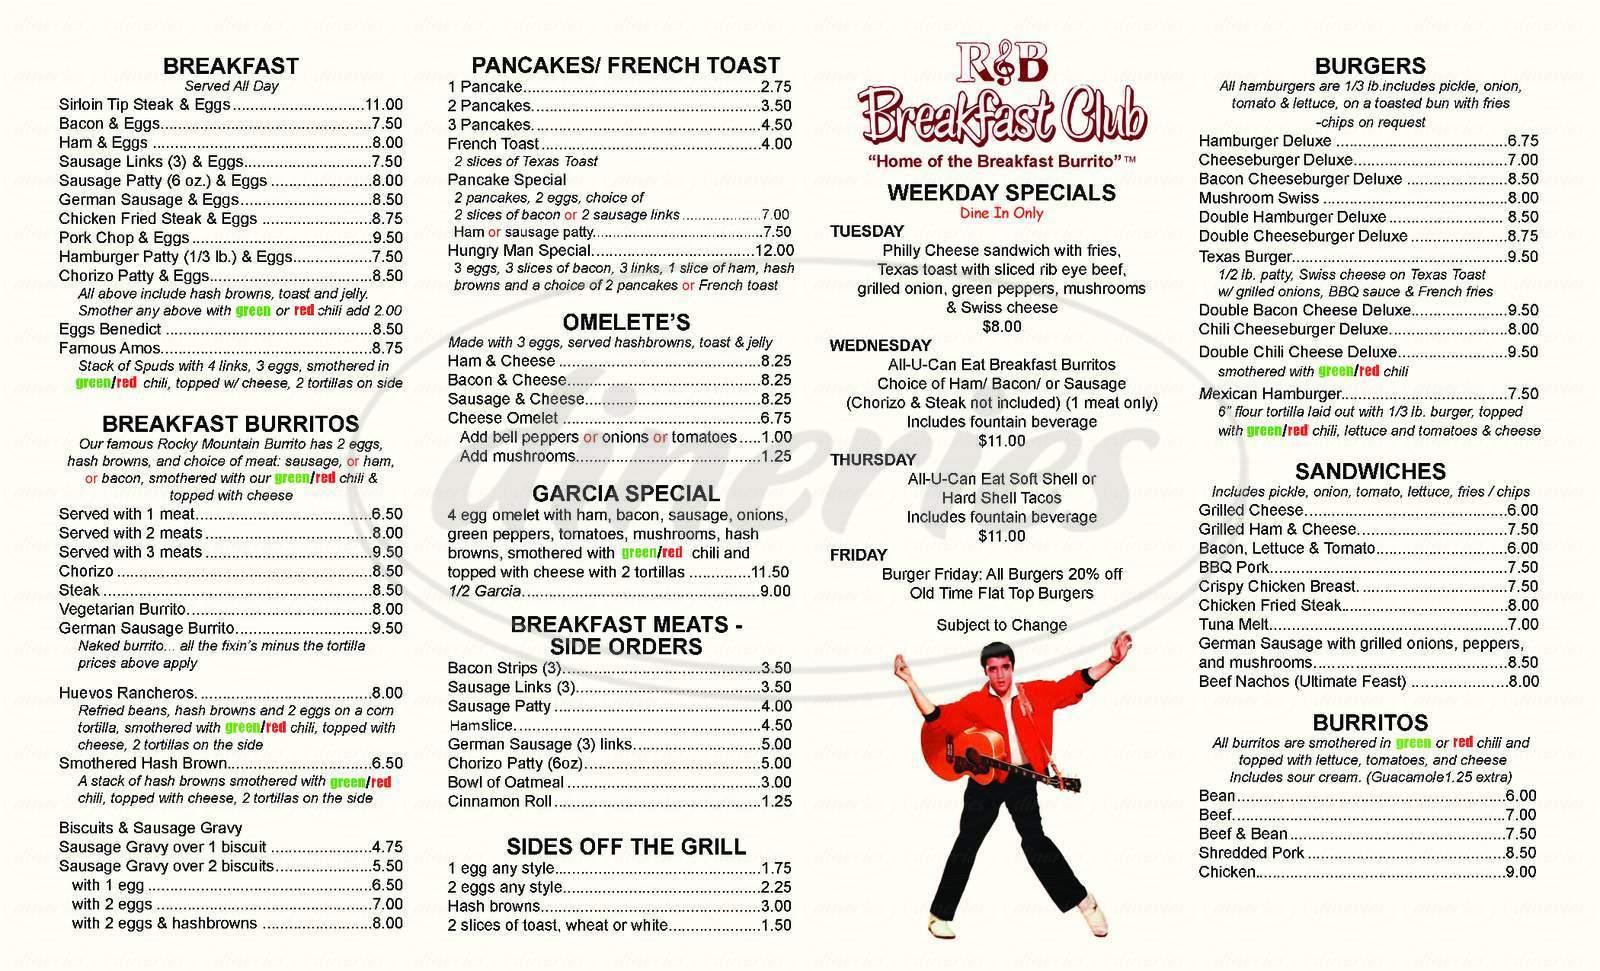 menu for R & B Breakfast Club